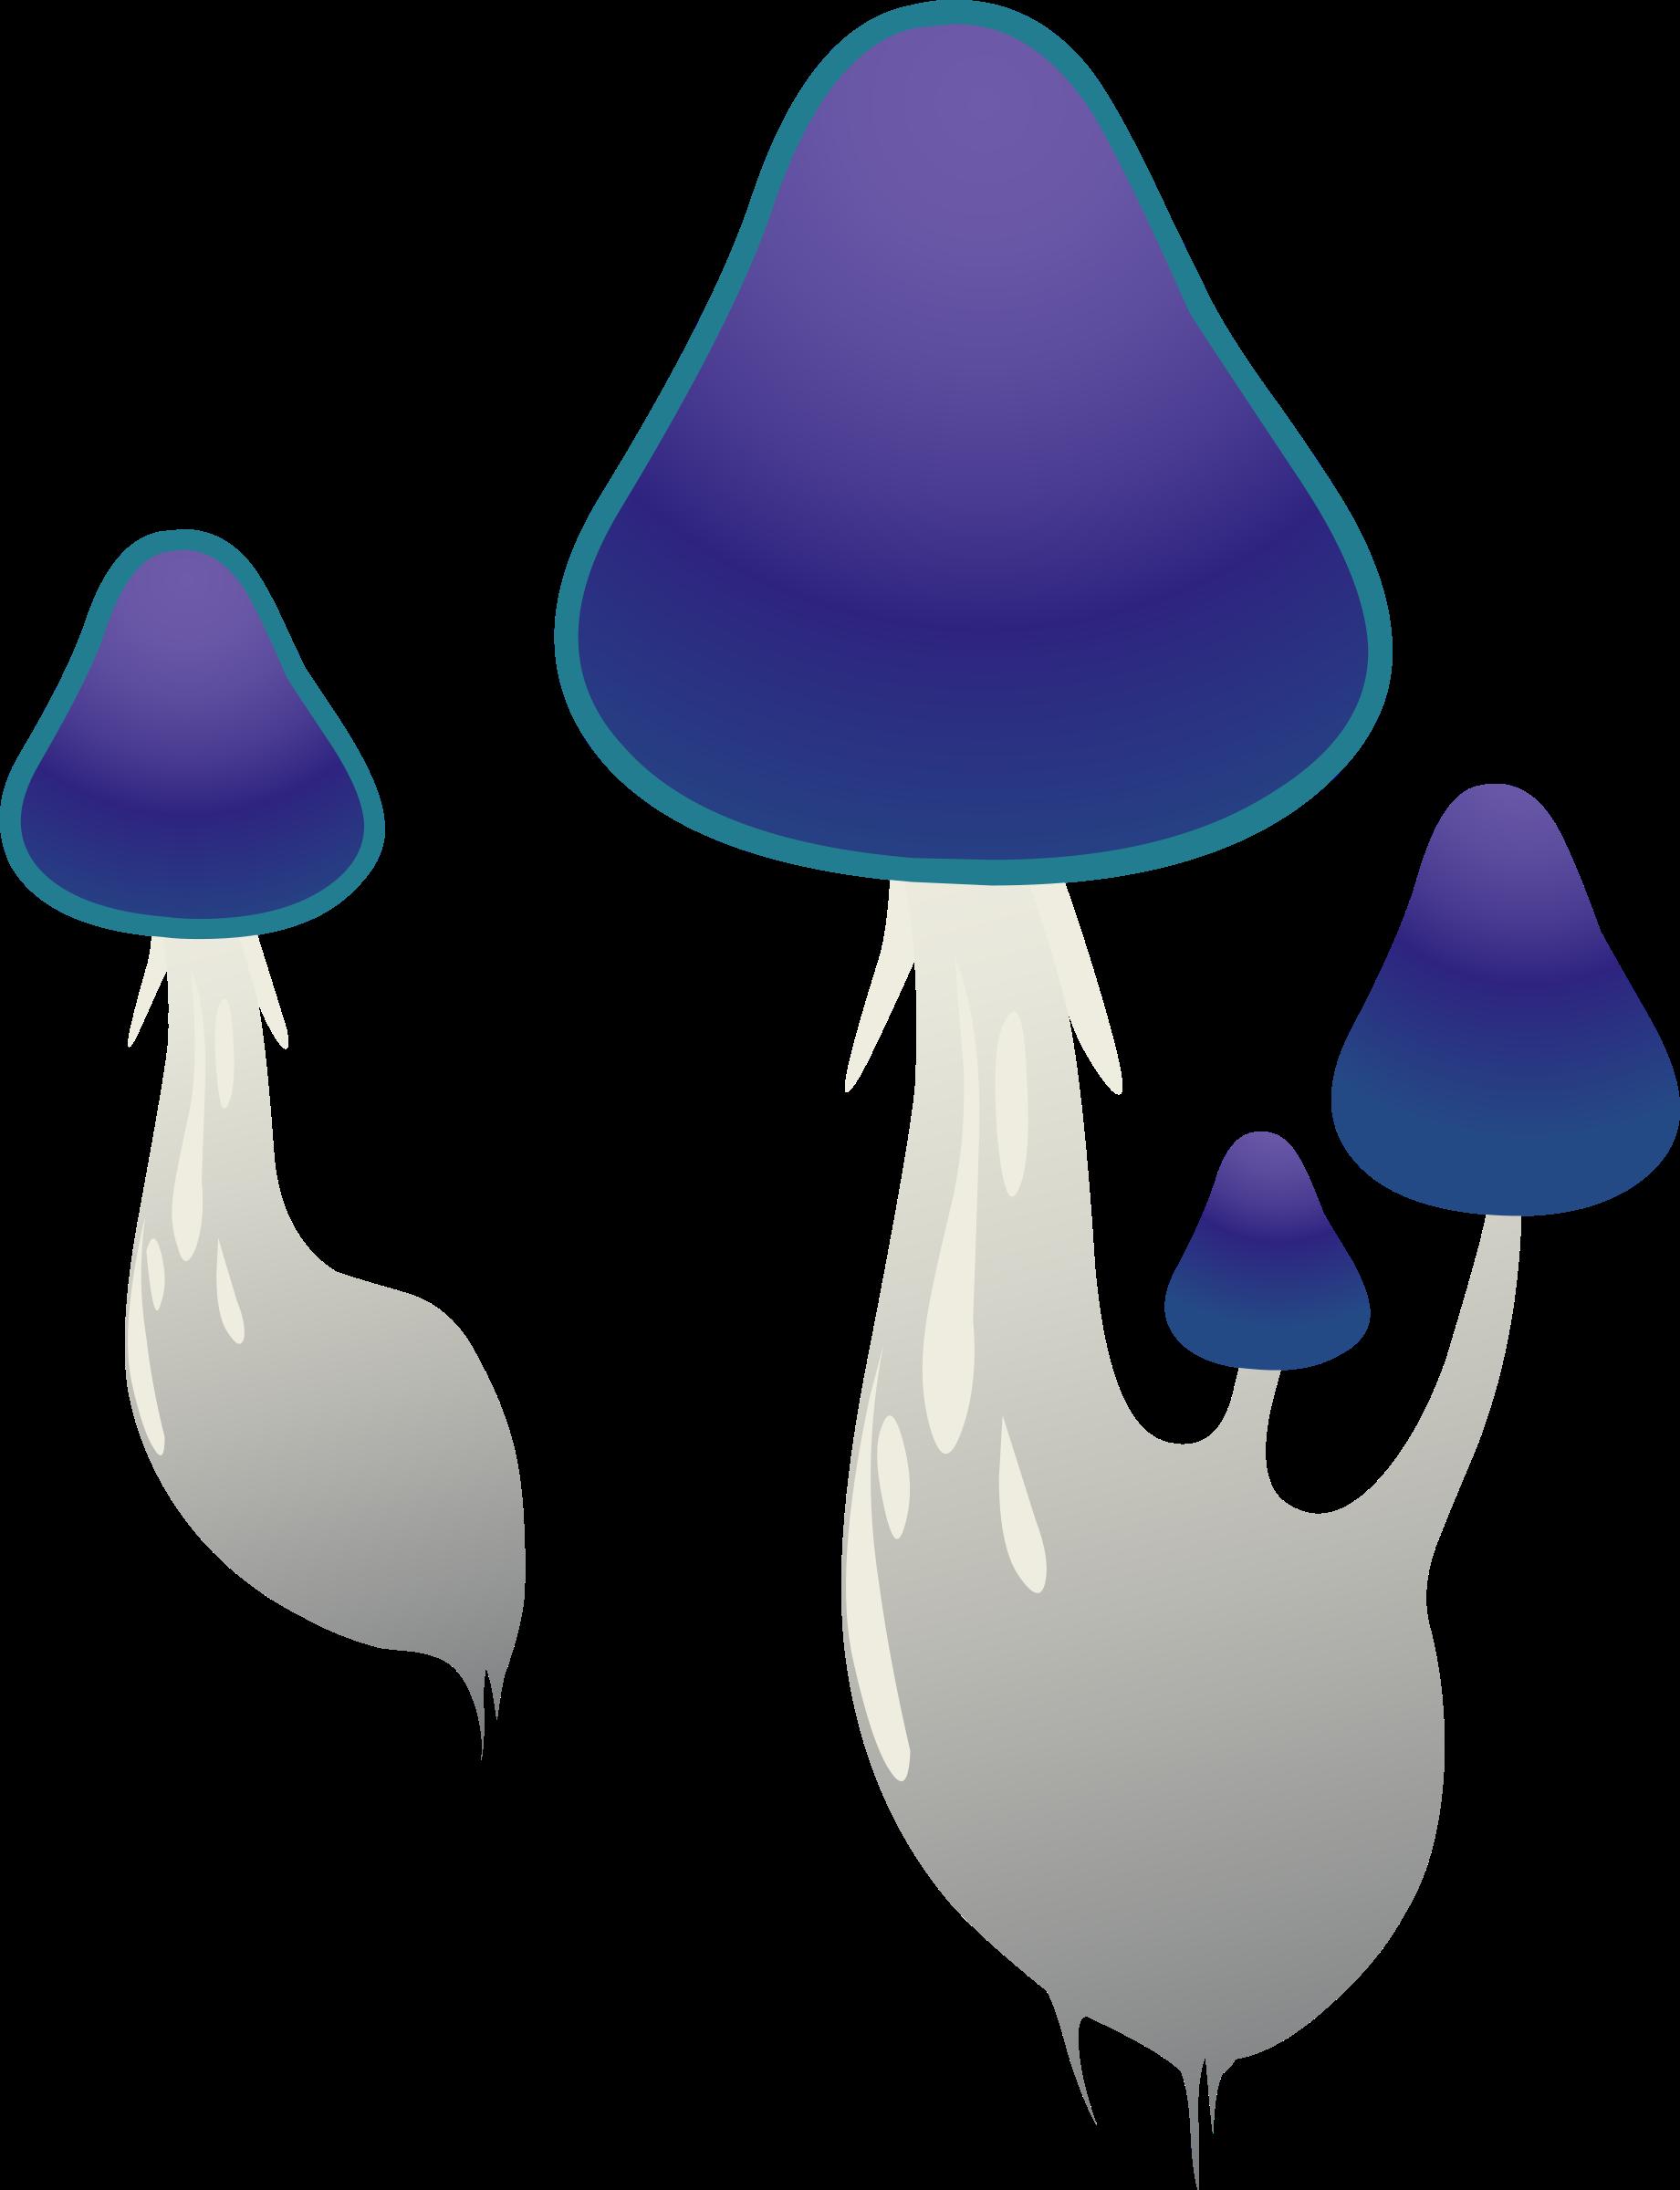 Glitch clipart purple Ilmenskie 1 1 Purple Mushroom